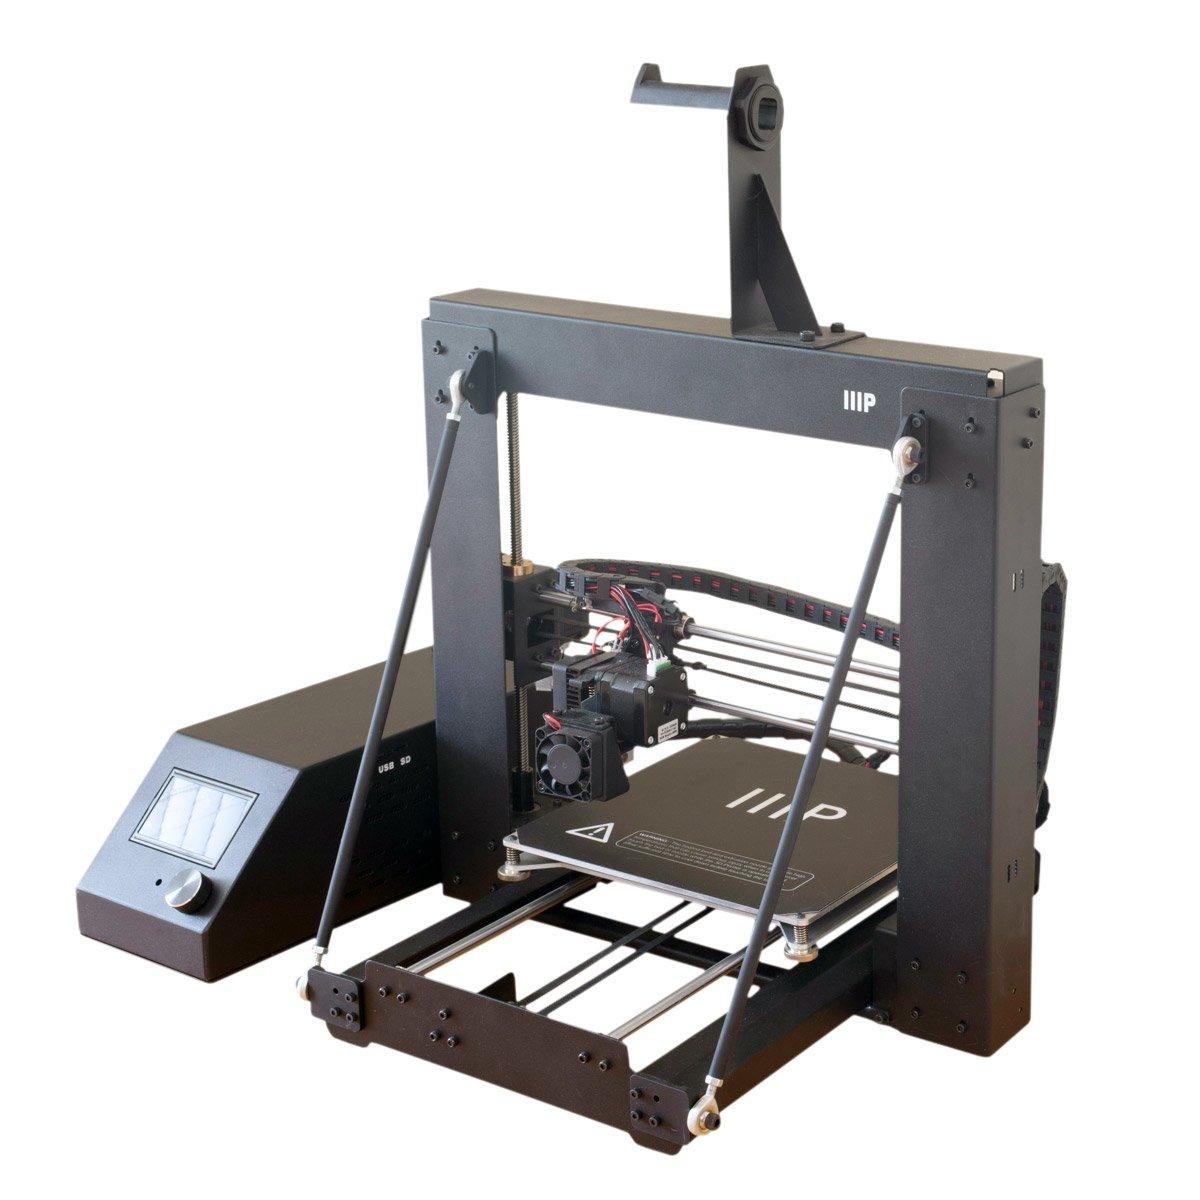 [Gulfcoast Robotics] Z-Brace Frame Support Kit for Wanhao Duplicator i3 and Maker Select V1, V2 and V2.1 3D Printers ZBRACE